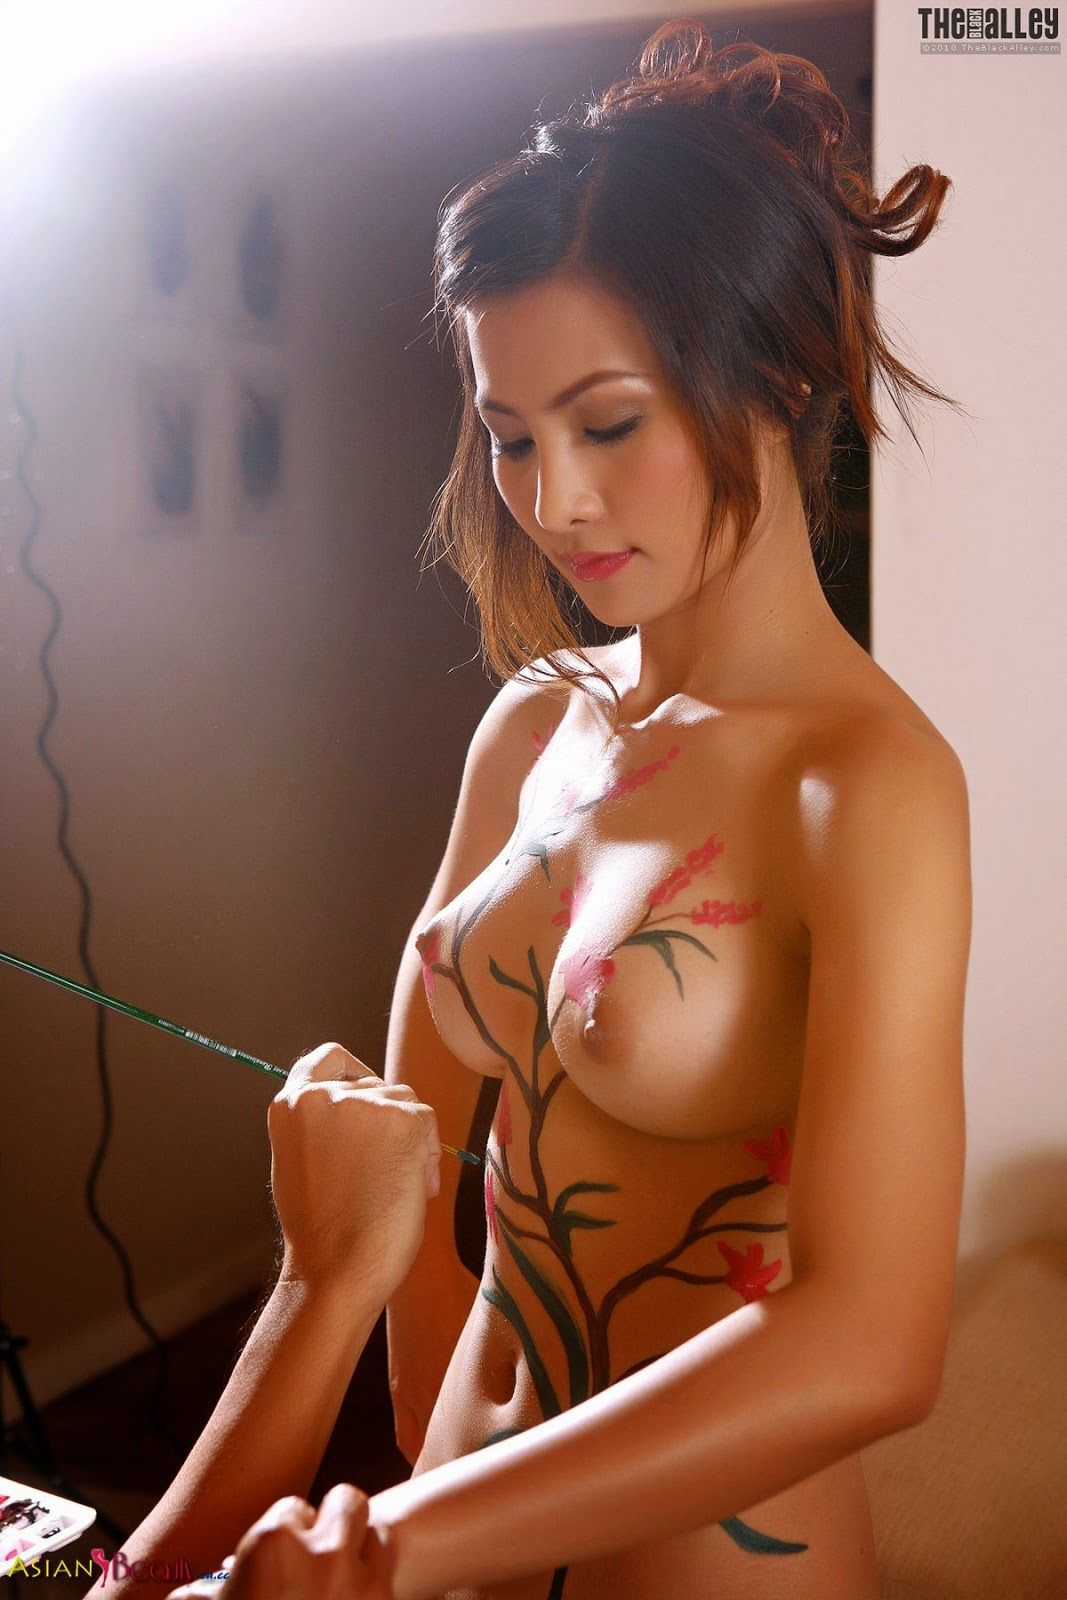 Erena pine body paint